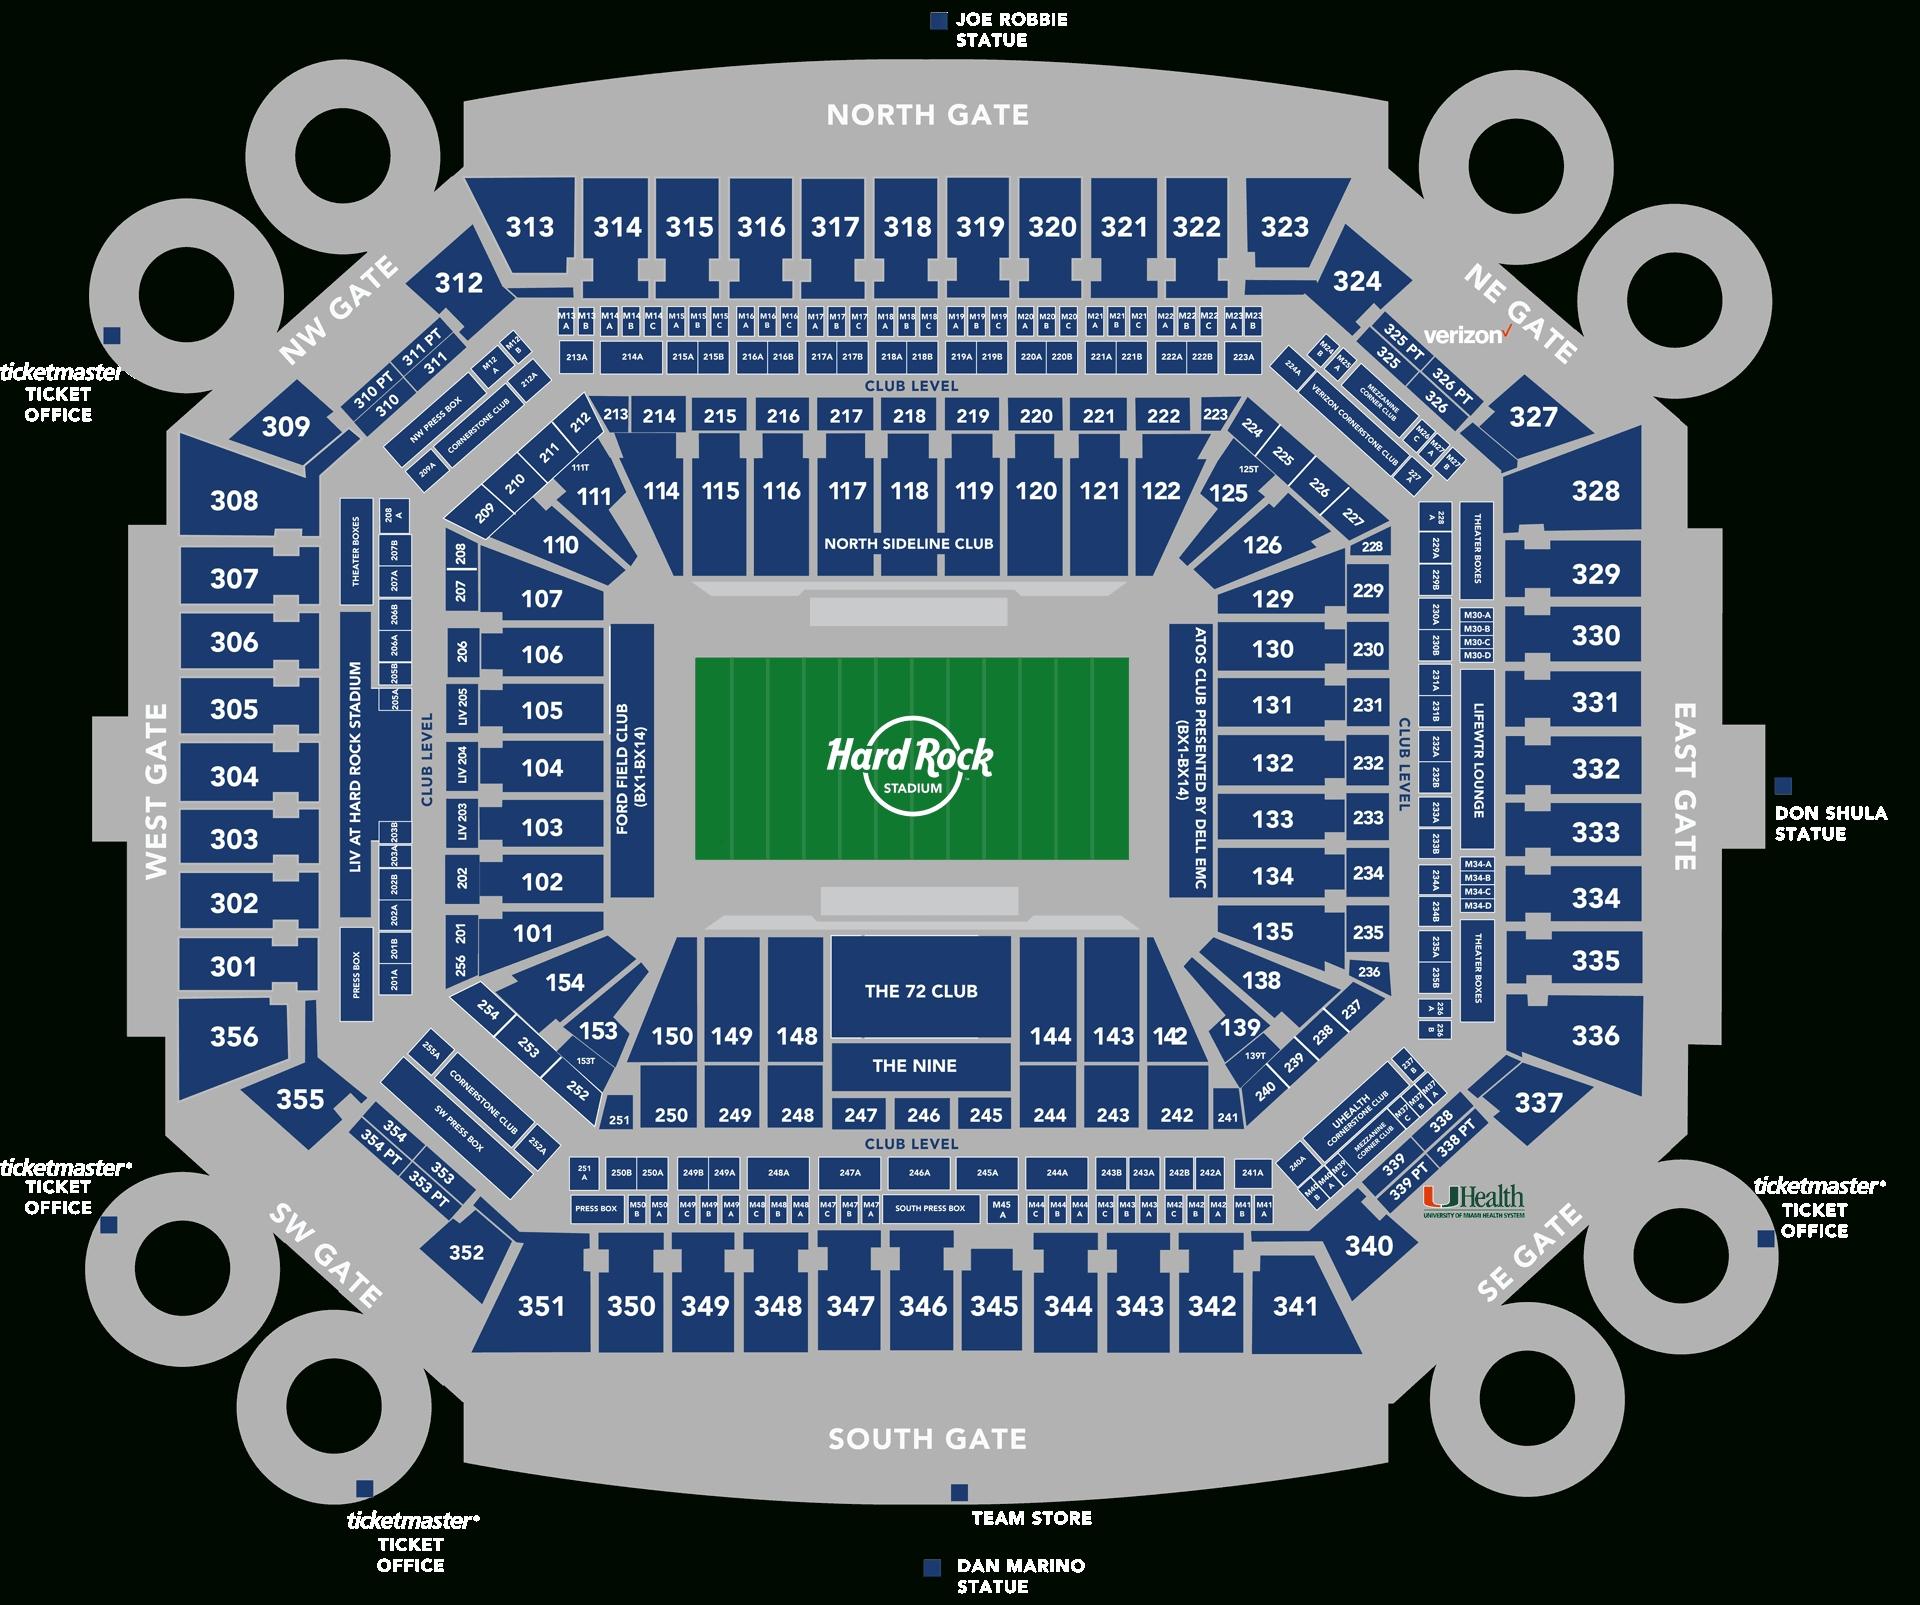 Stadium Seating Chart - Hard Rock Stadium within Super Bowl Stadium 2019 Seating Chart